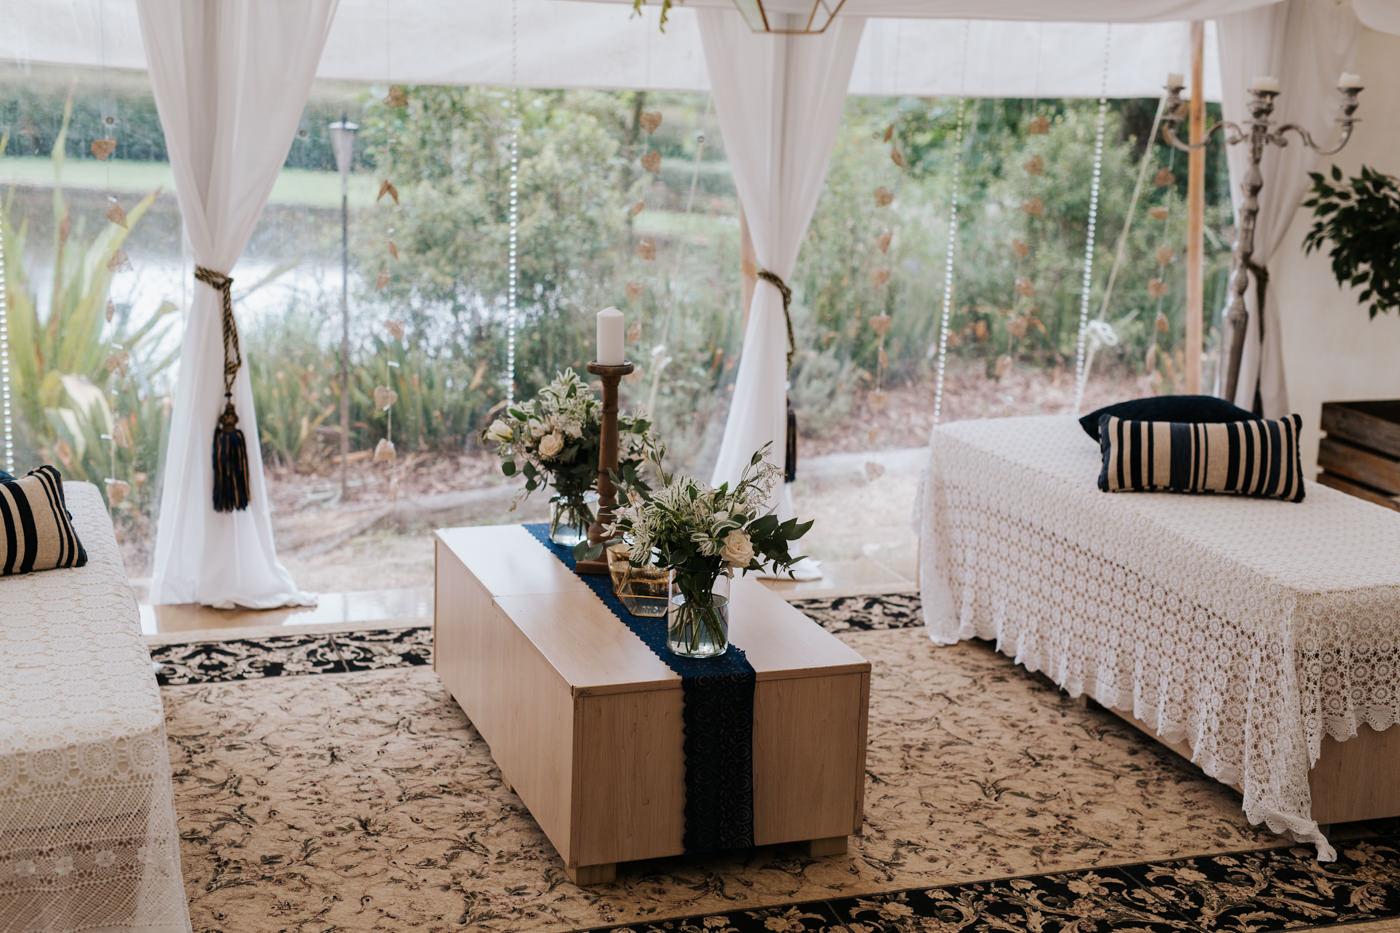 Nick & Vanezza - Fernbank Farm Wedding - Samantha Heather Photography-41.jpg